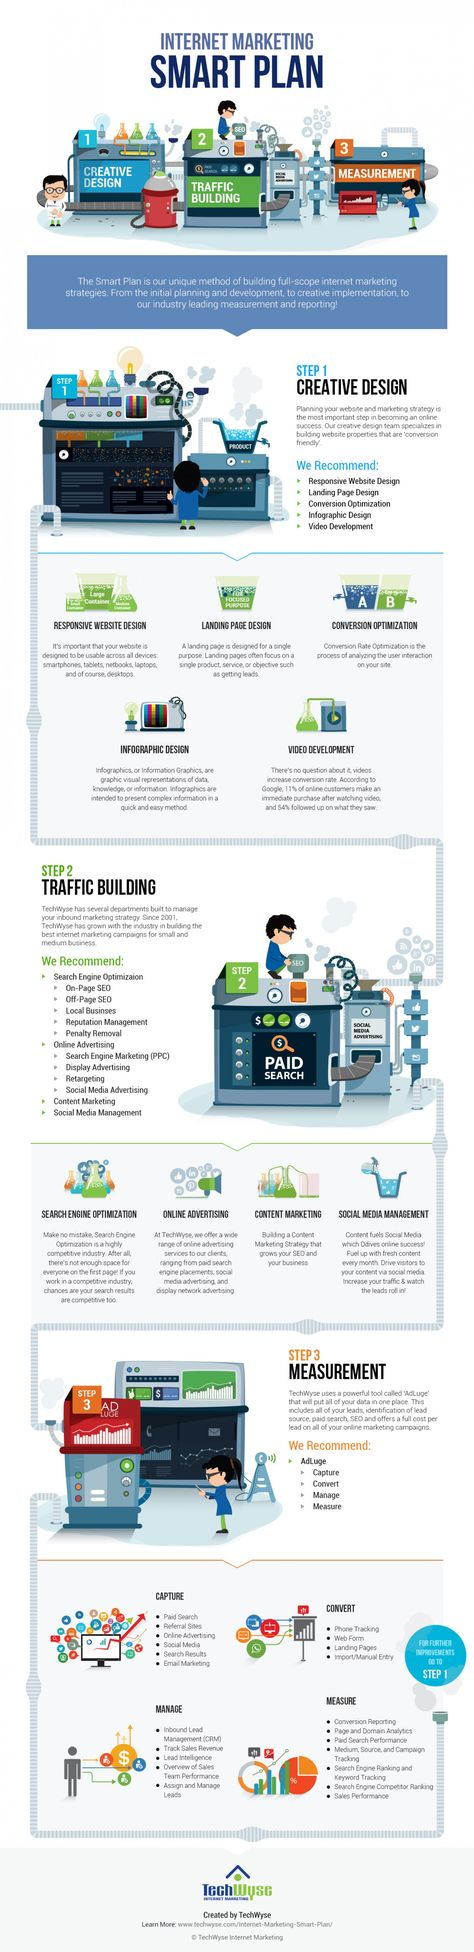 Internet Marketing Smart Plan